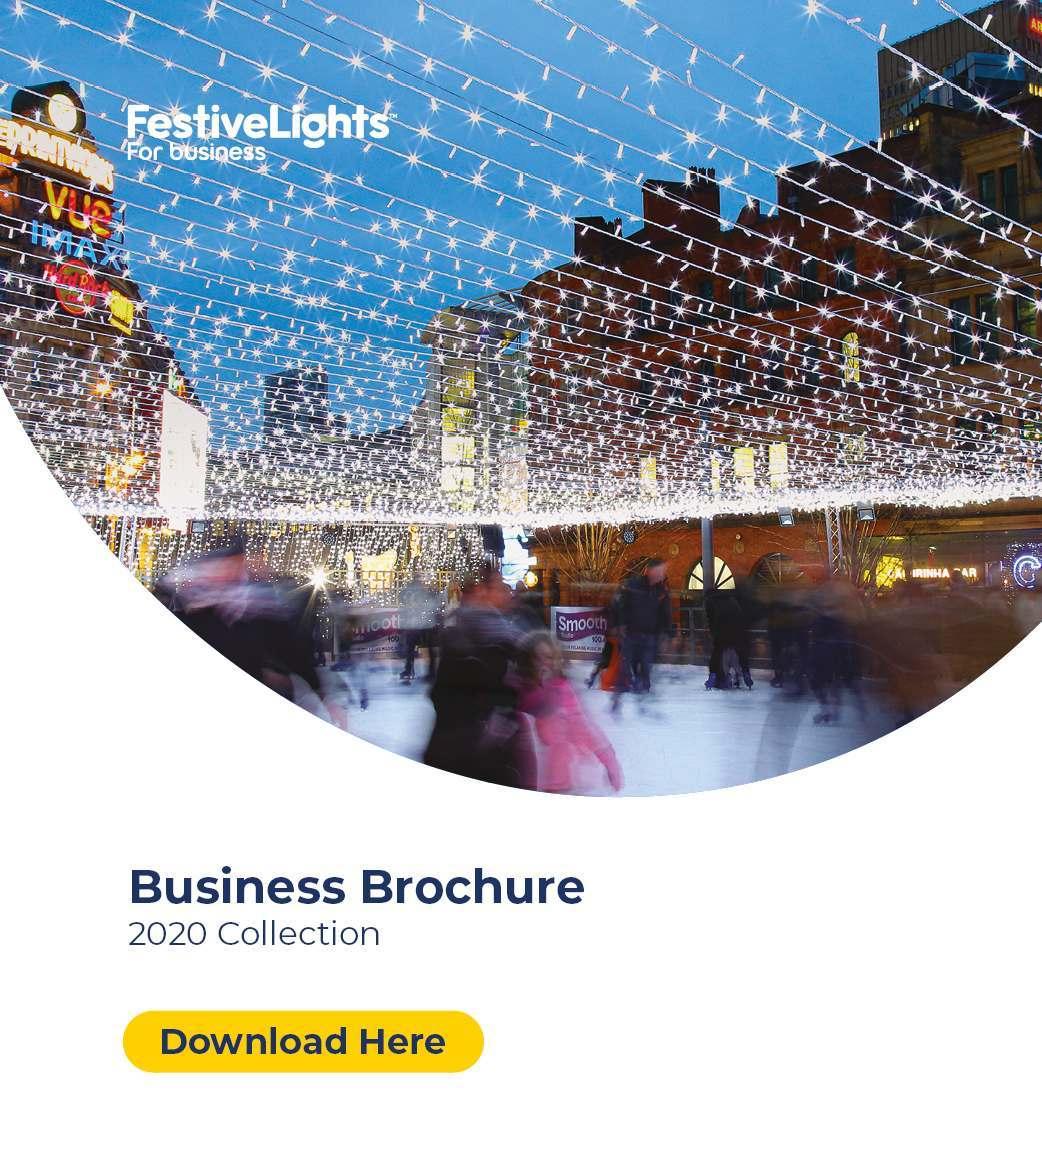 Festive Lights 2020 Collection Brochure